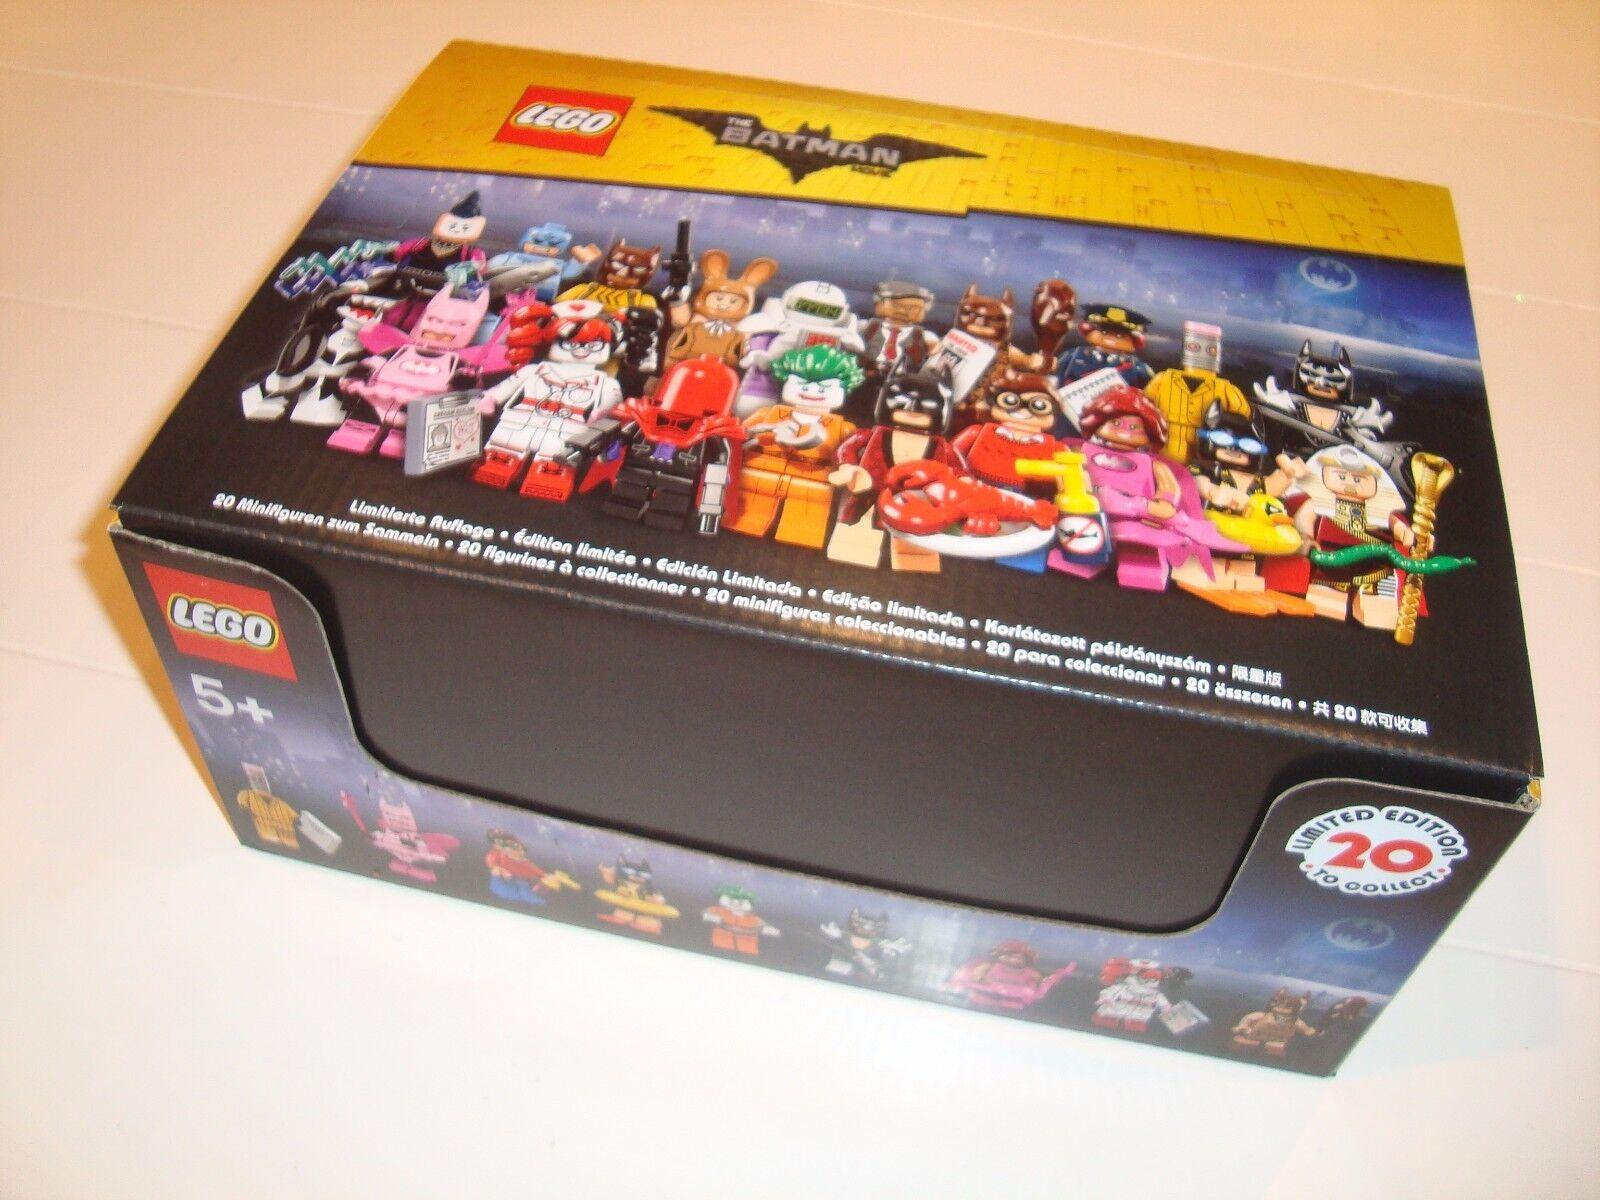 Lego 6175009 Minifigures The Batman Movie Series (Box of 60 blind bags  71017)